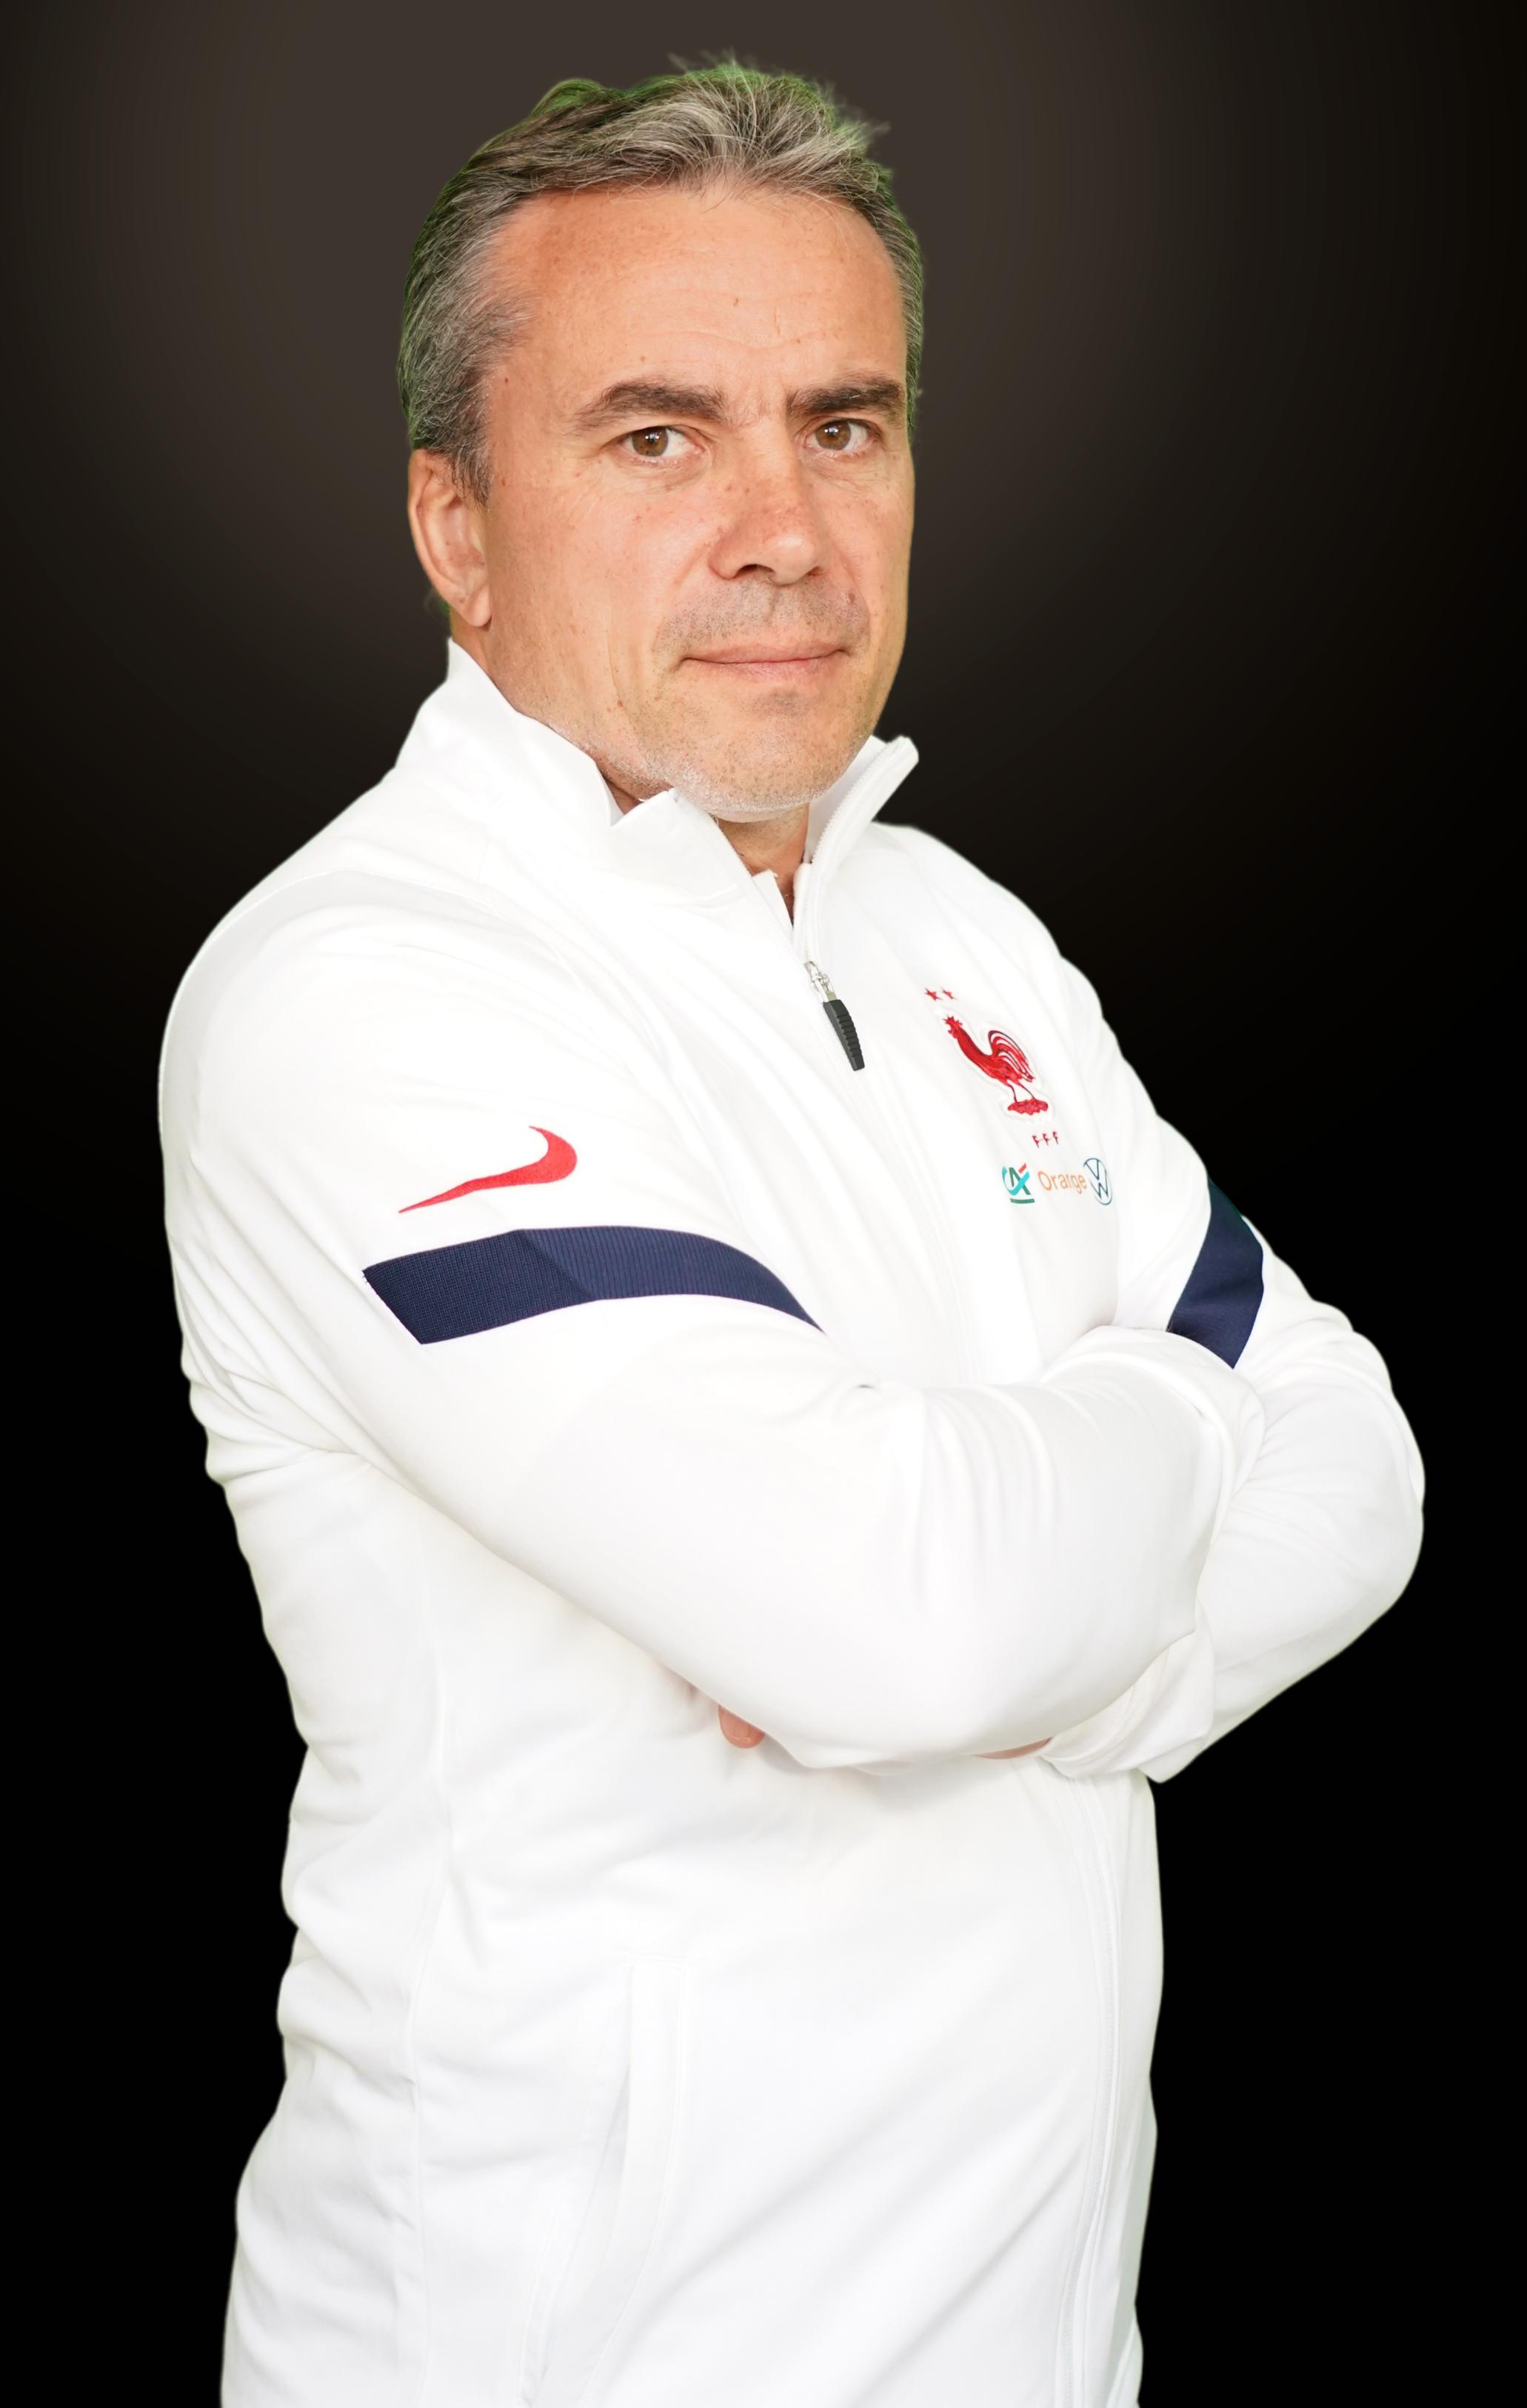 Philippe Brocherieux